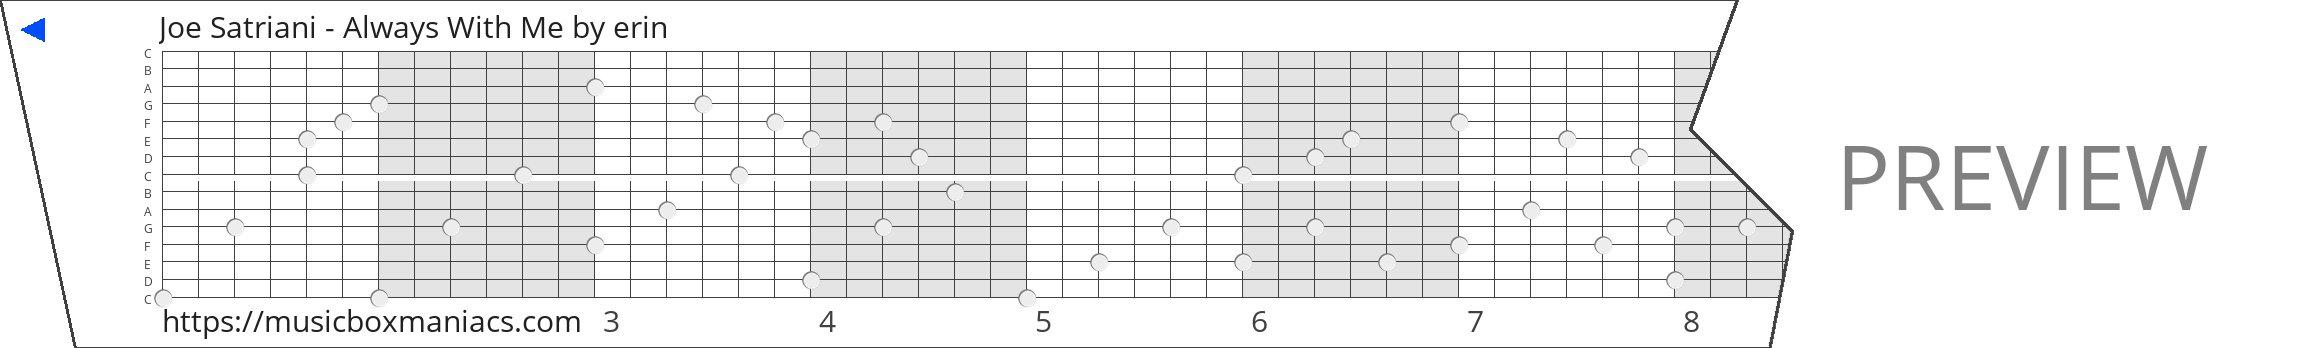 Joe Satriani - Always With Me 15 note music box paper strip